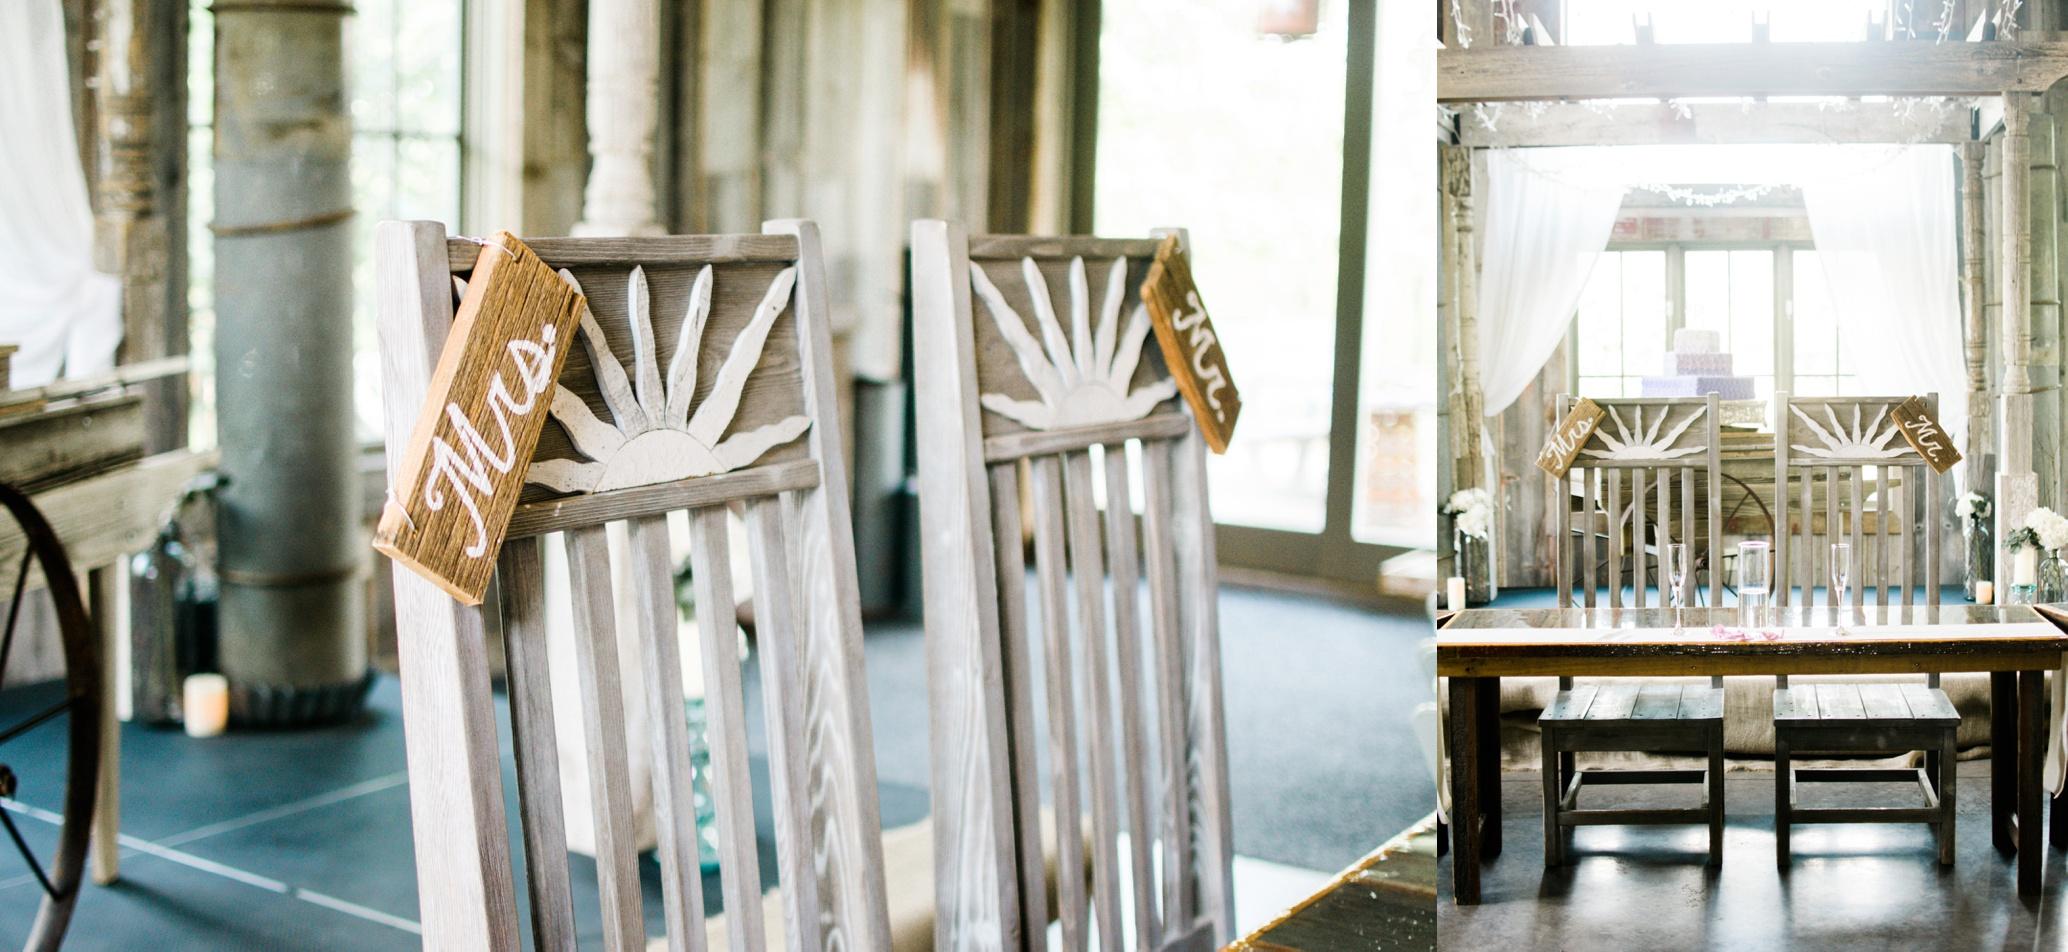 Barnes' Place Rustic Outdoor Wedding | Ali Leigh Photo Minneapolis Wedding Photographer_0134.jpg